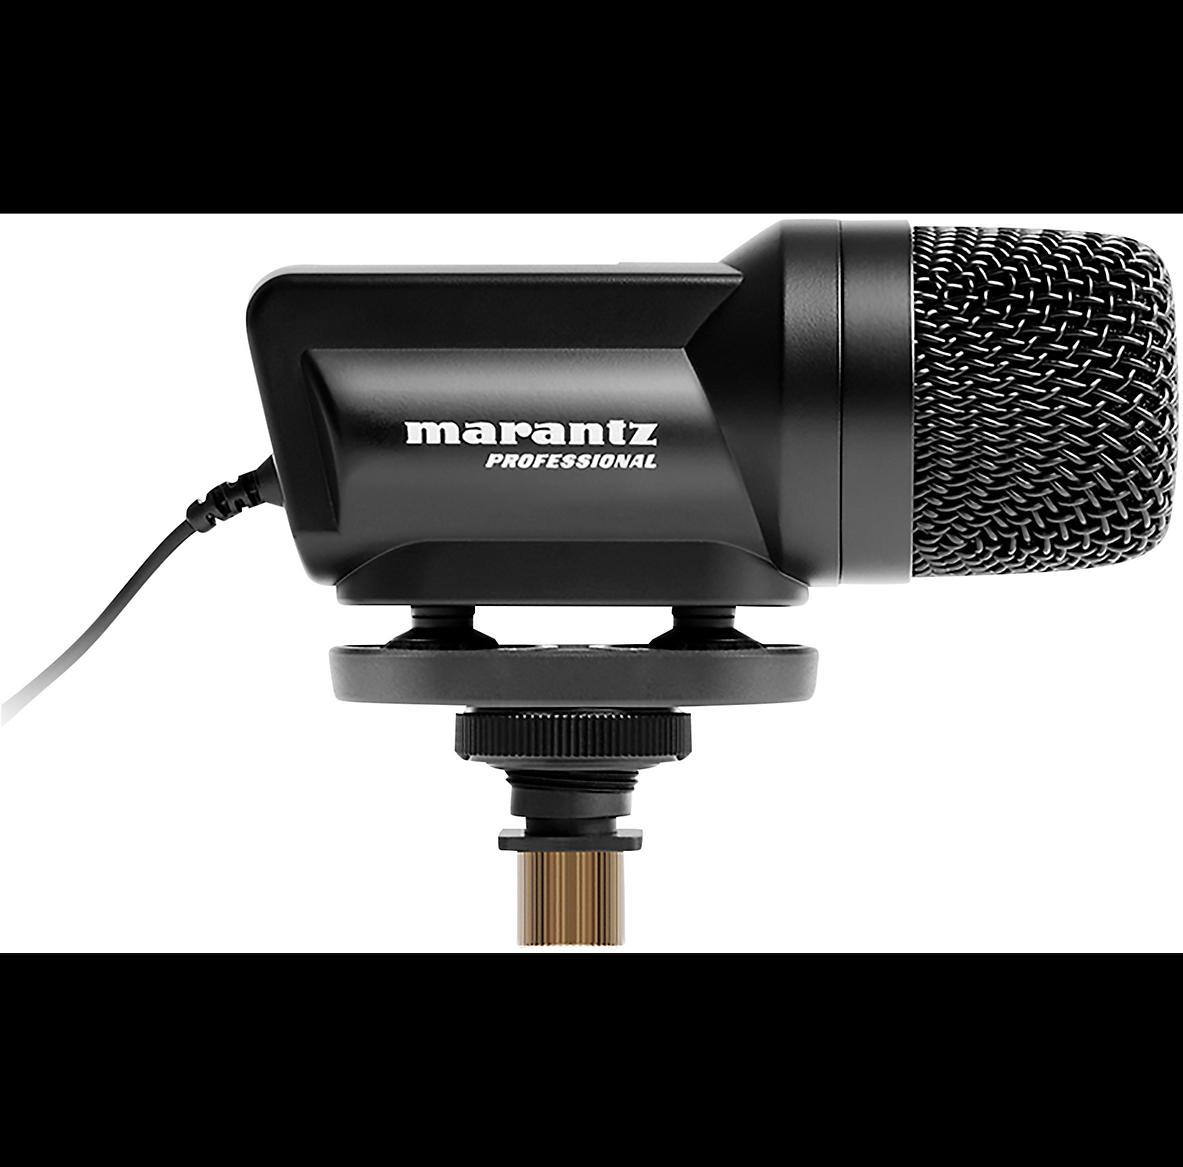 Marantz Professional Audio Scope SB-C2 X Y Stereo condenser mic for DSLR cameras